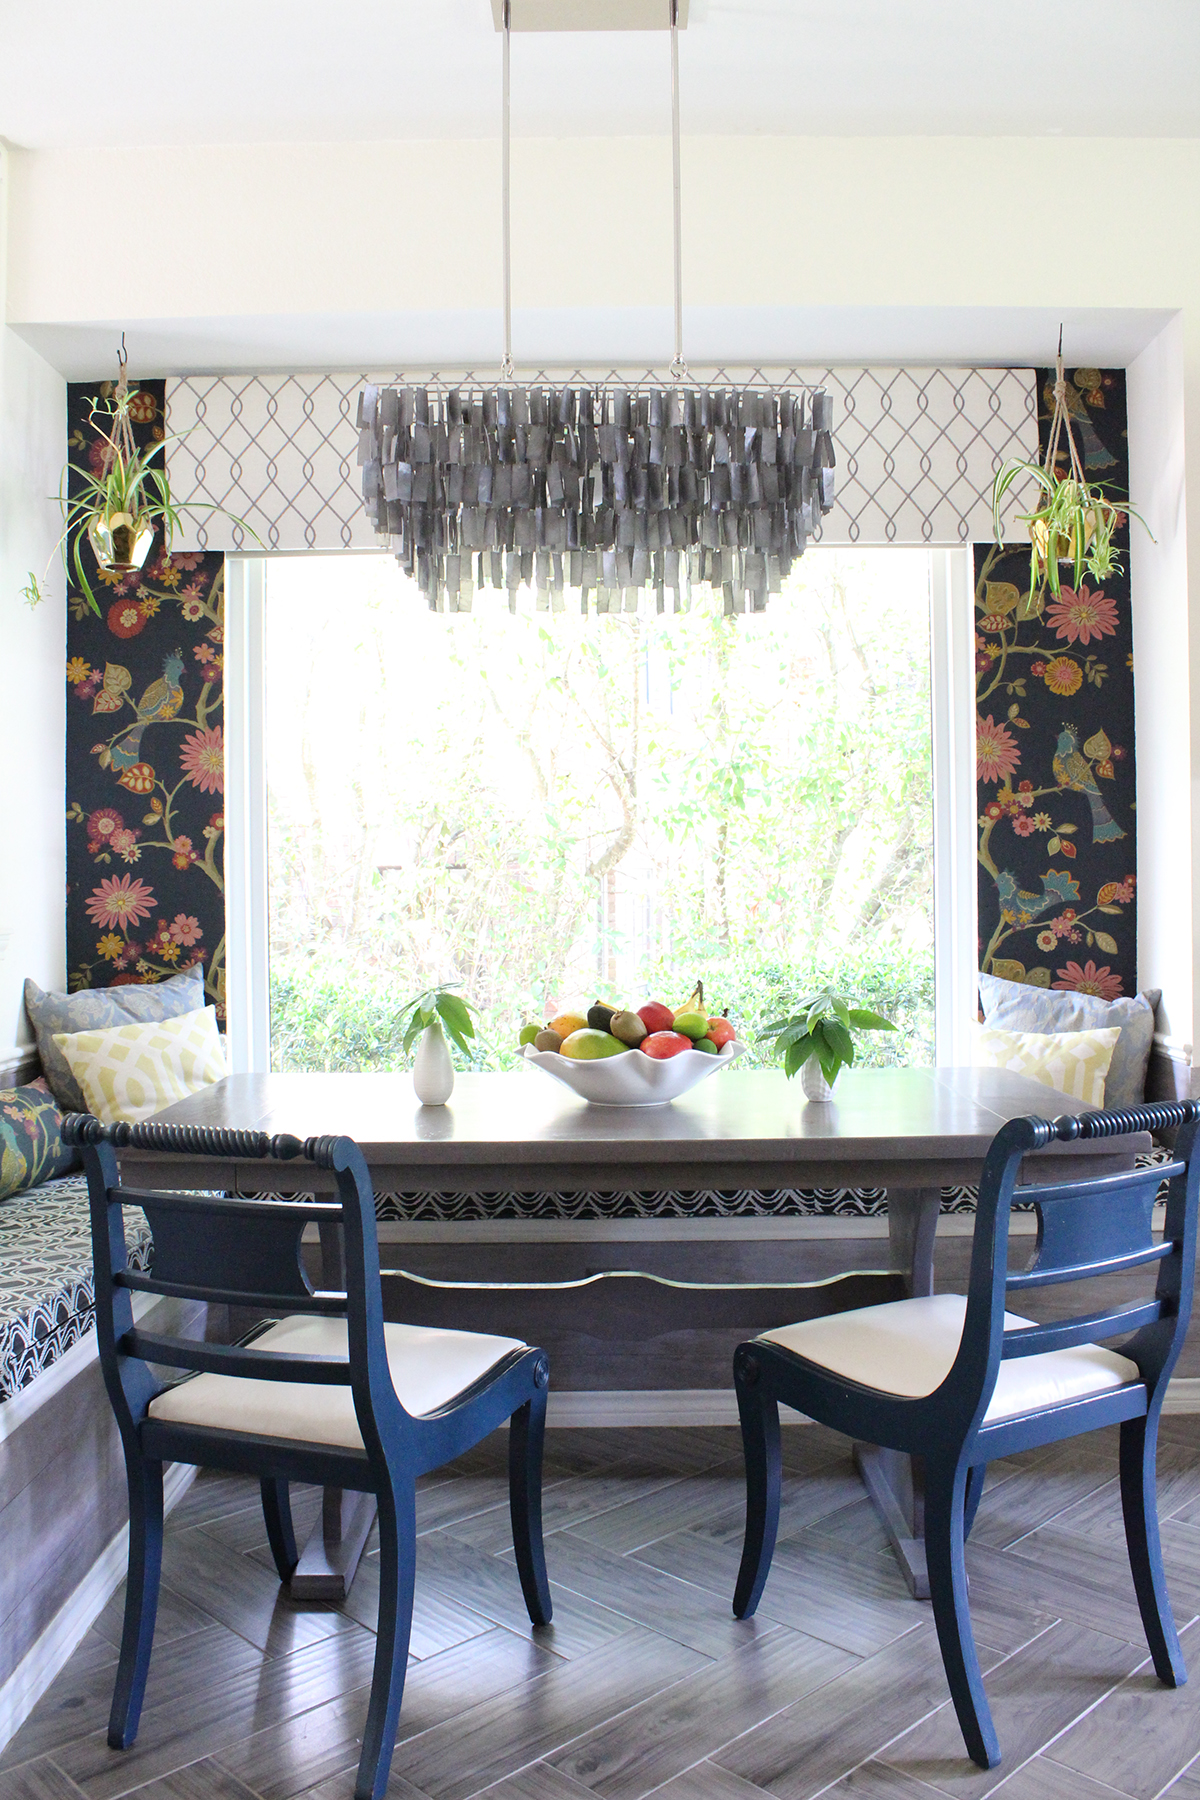 Breakfast nook featuring fabric wallpaper, capiz chandelier and herringbone tile floors by Kristin Laing Designs